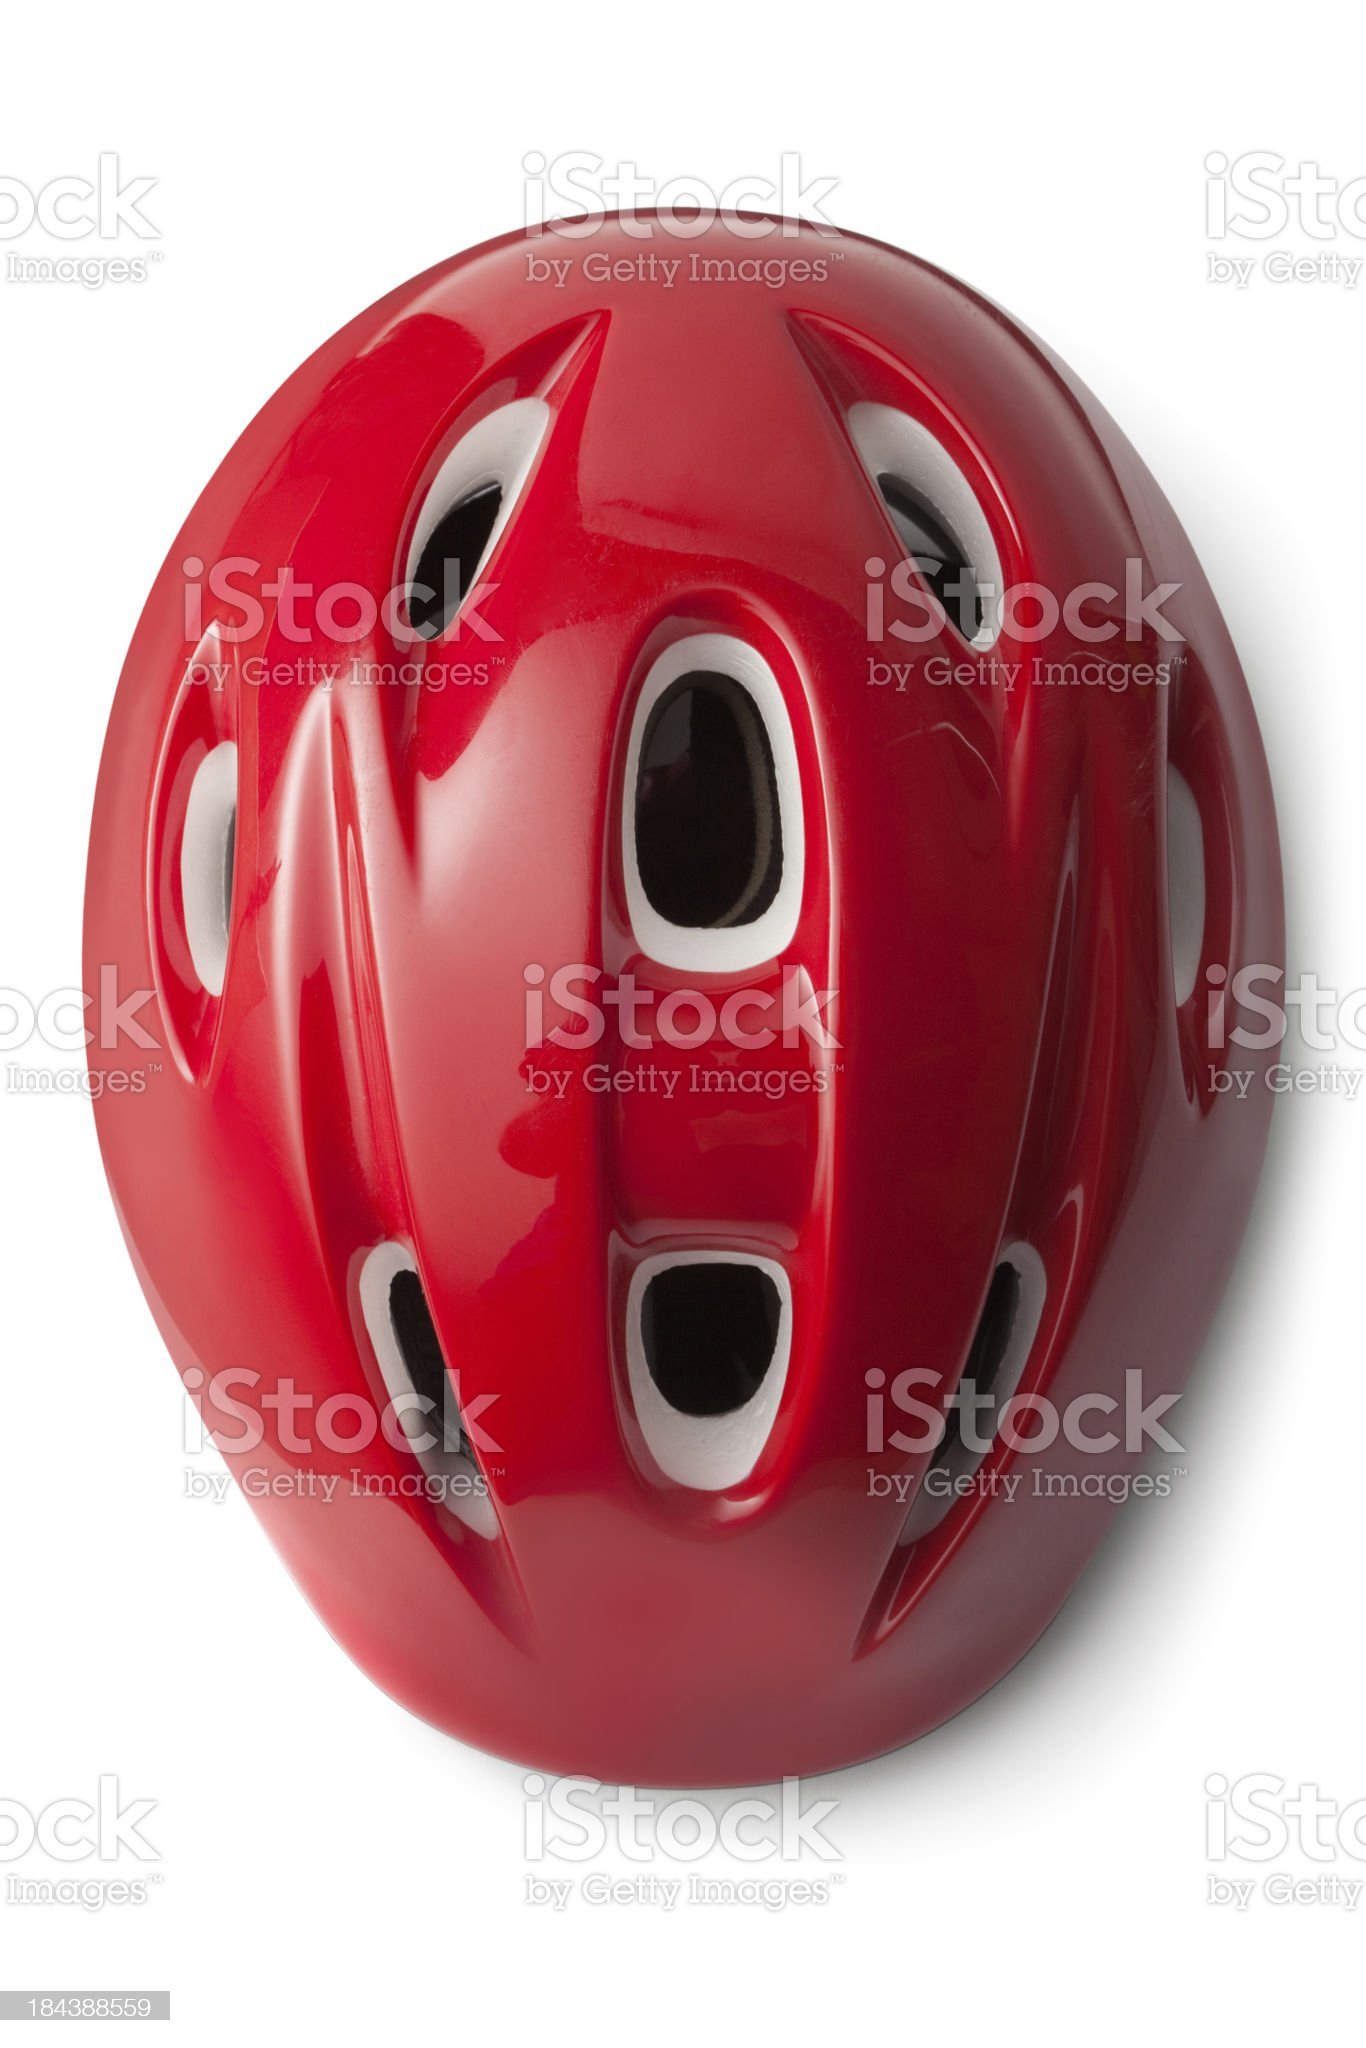 Hats: Bicycle Helmet royalty-free stock photo